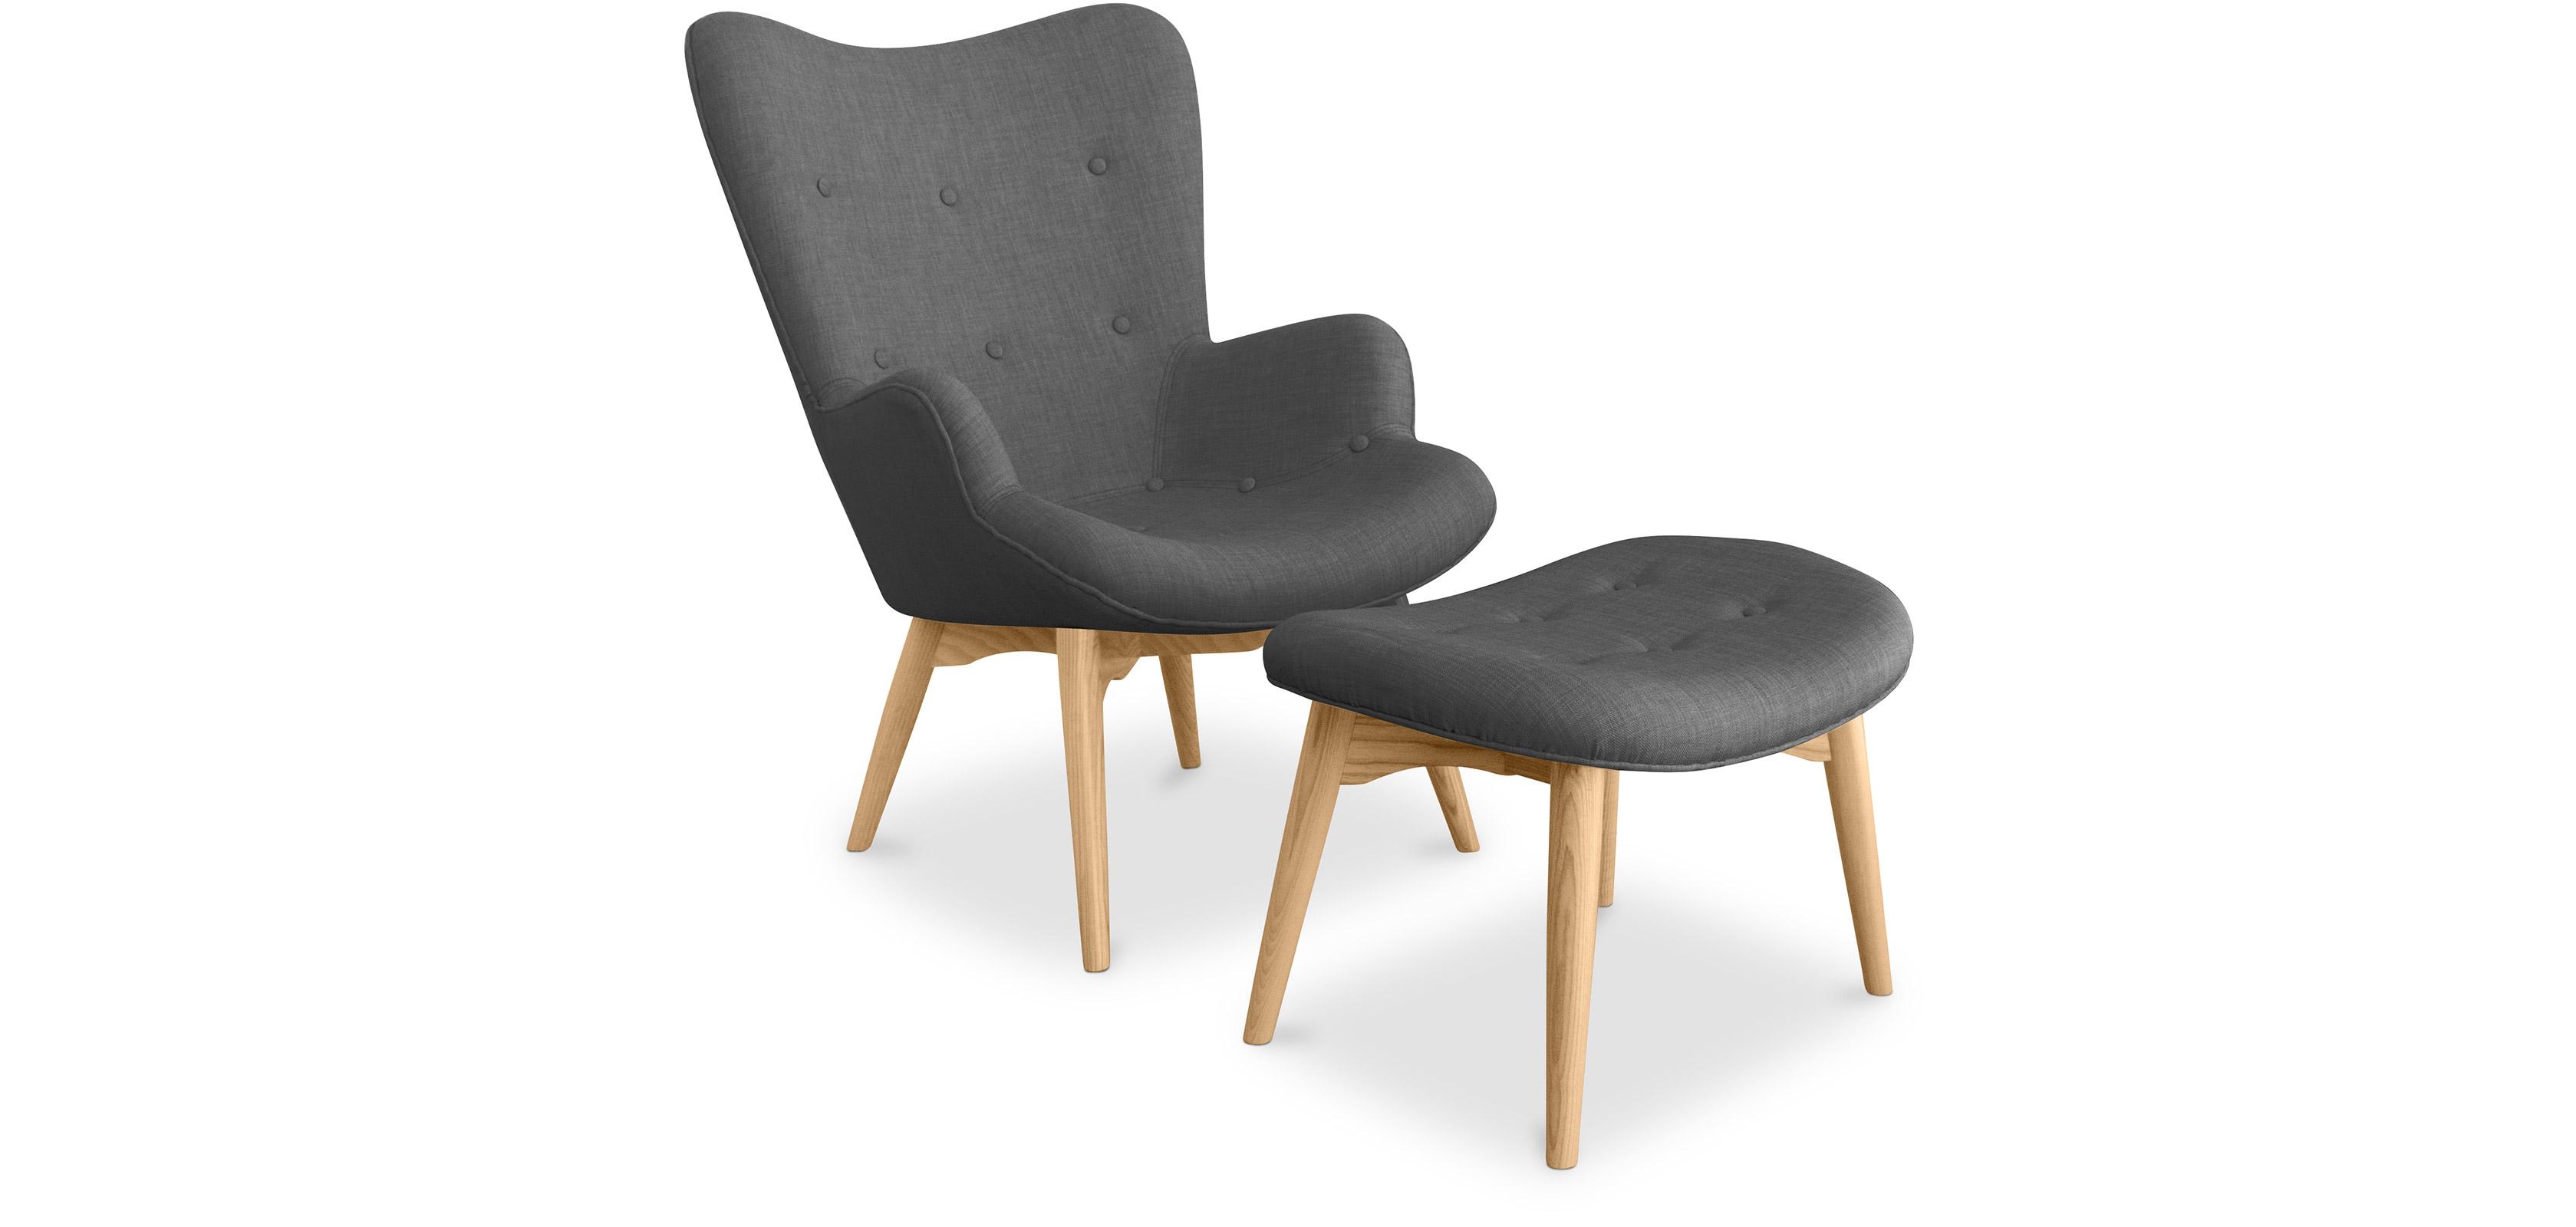 contour sessel und fu bank skandinavisches design grant featherston style. Black Bedroom Furniture Sets. Home Design Ideas